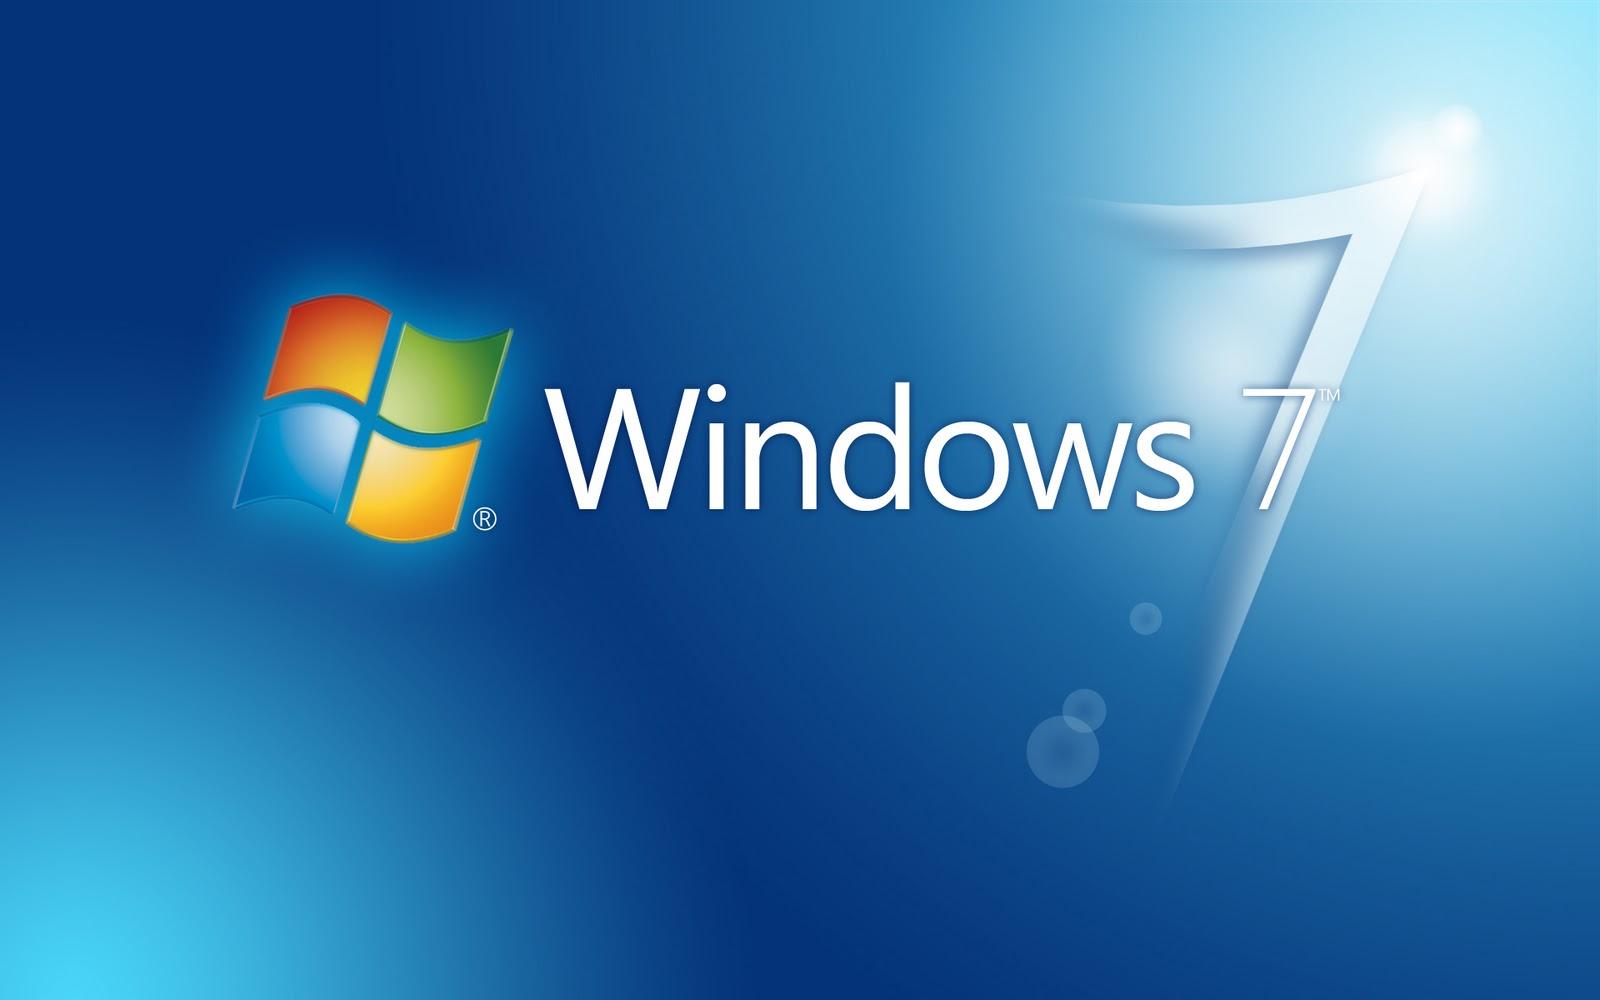 acceso directo al protector de pantalla windows 7